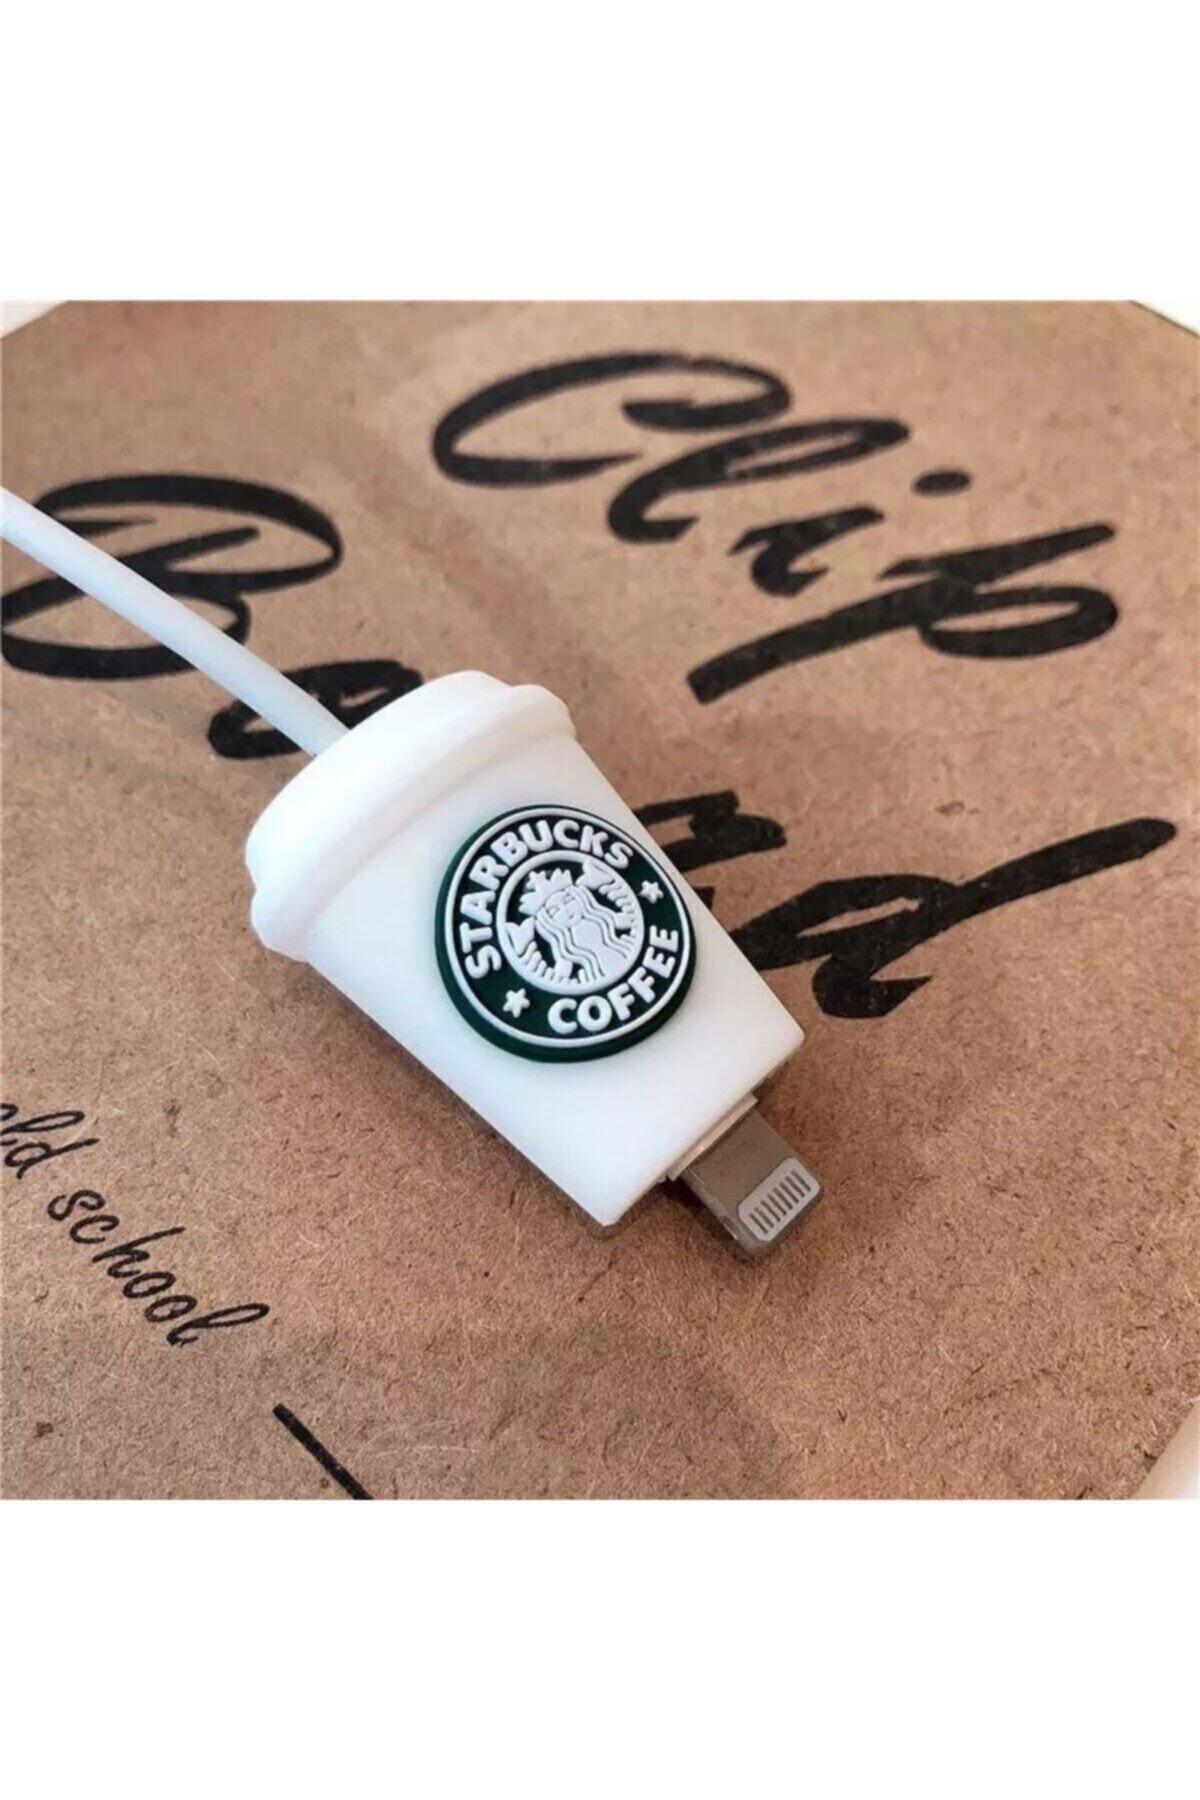 Telehome Sevimli Starbucks Kablo Koruyucu 1